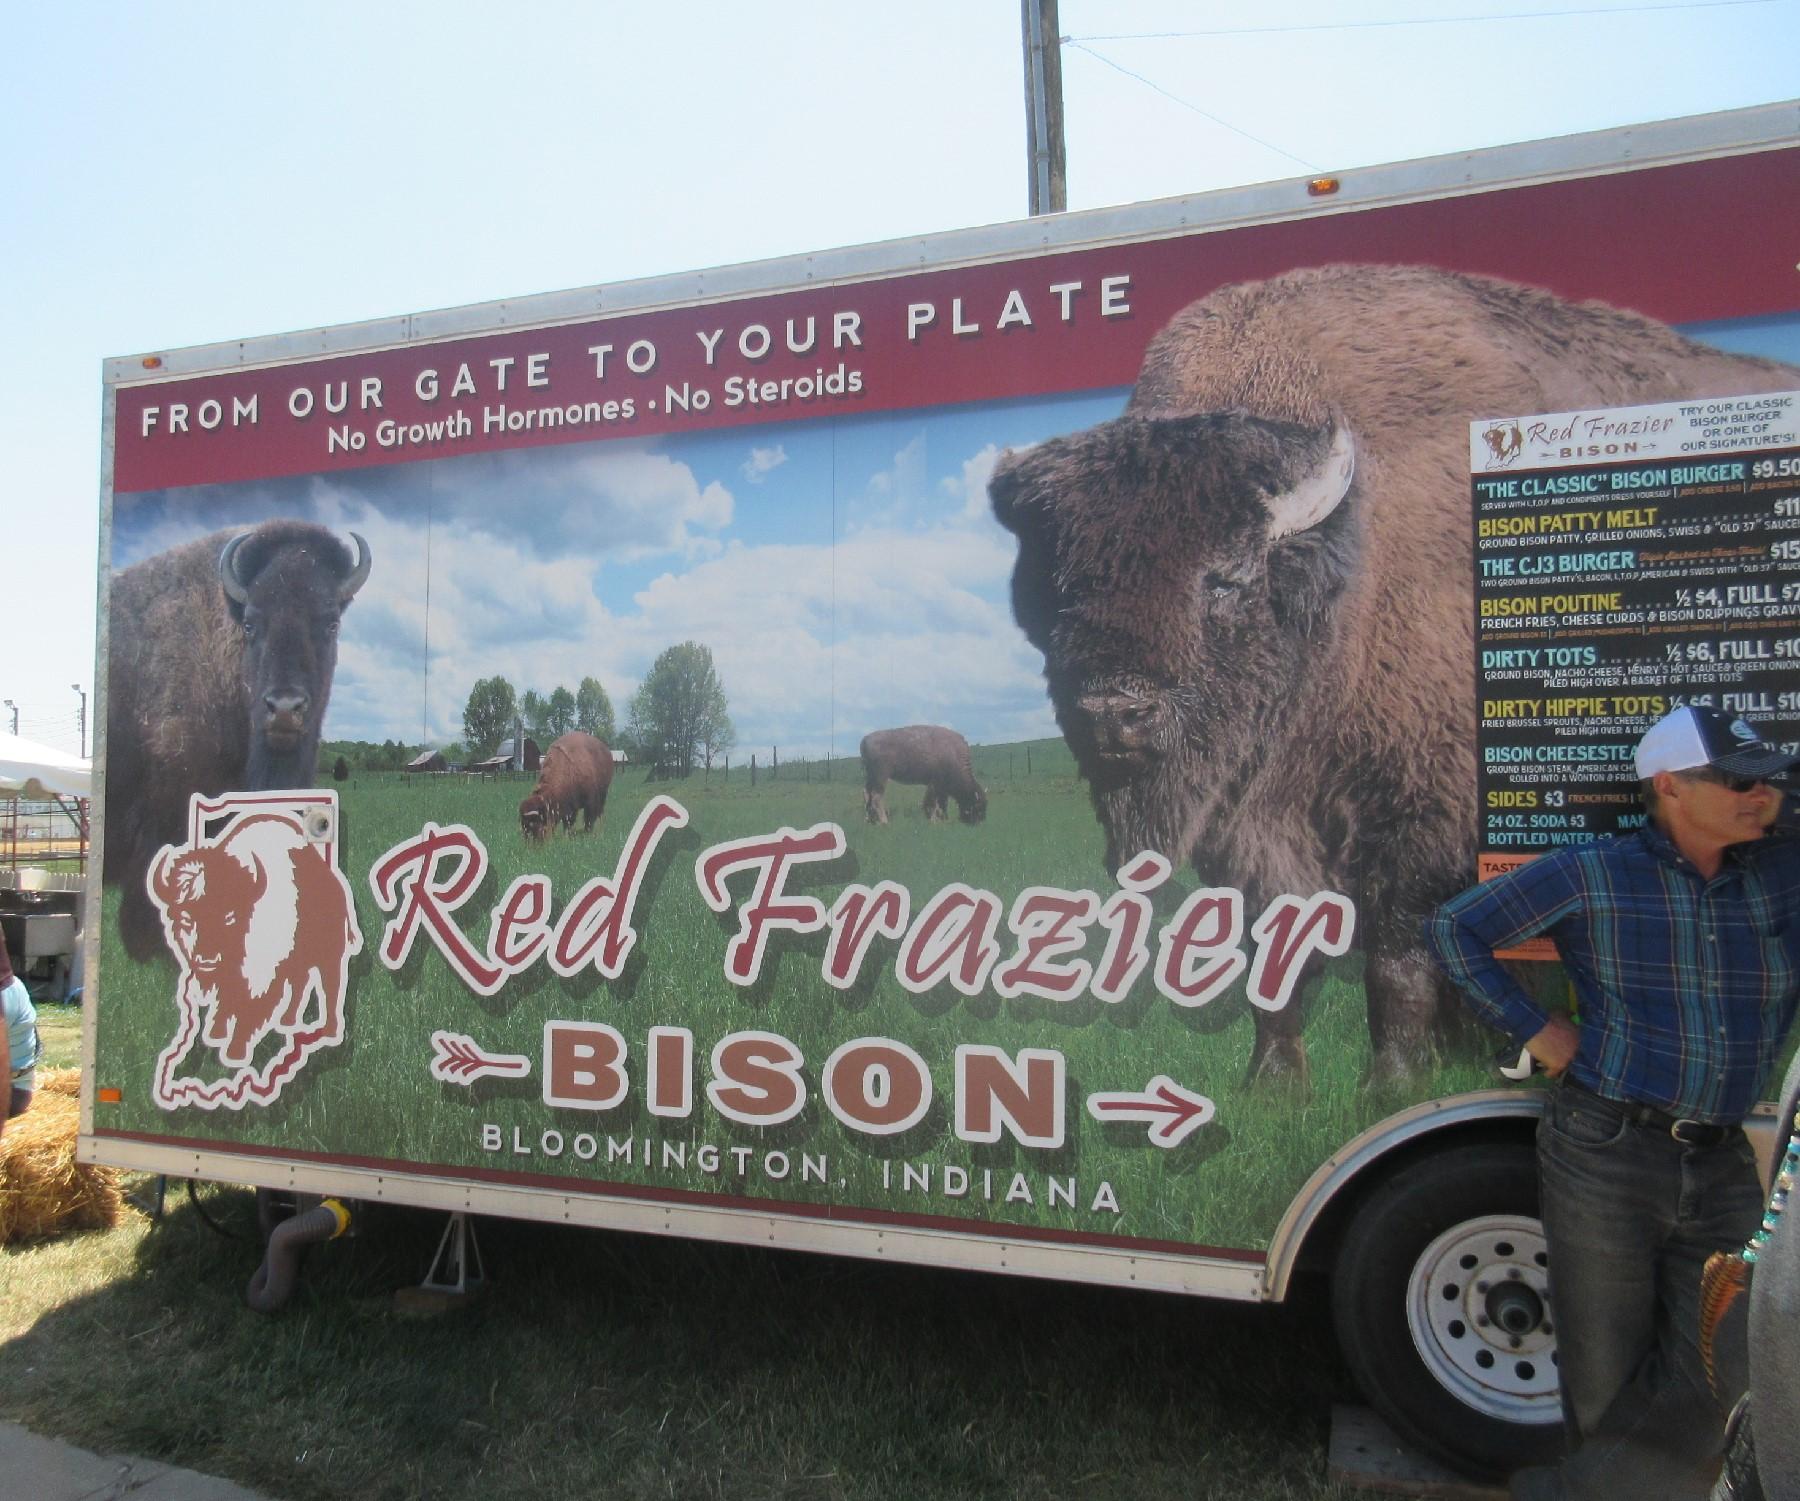 Red Food Truck Uofot Summer